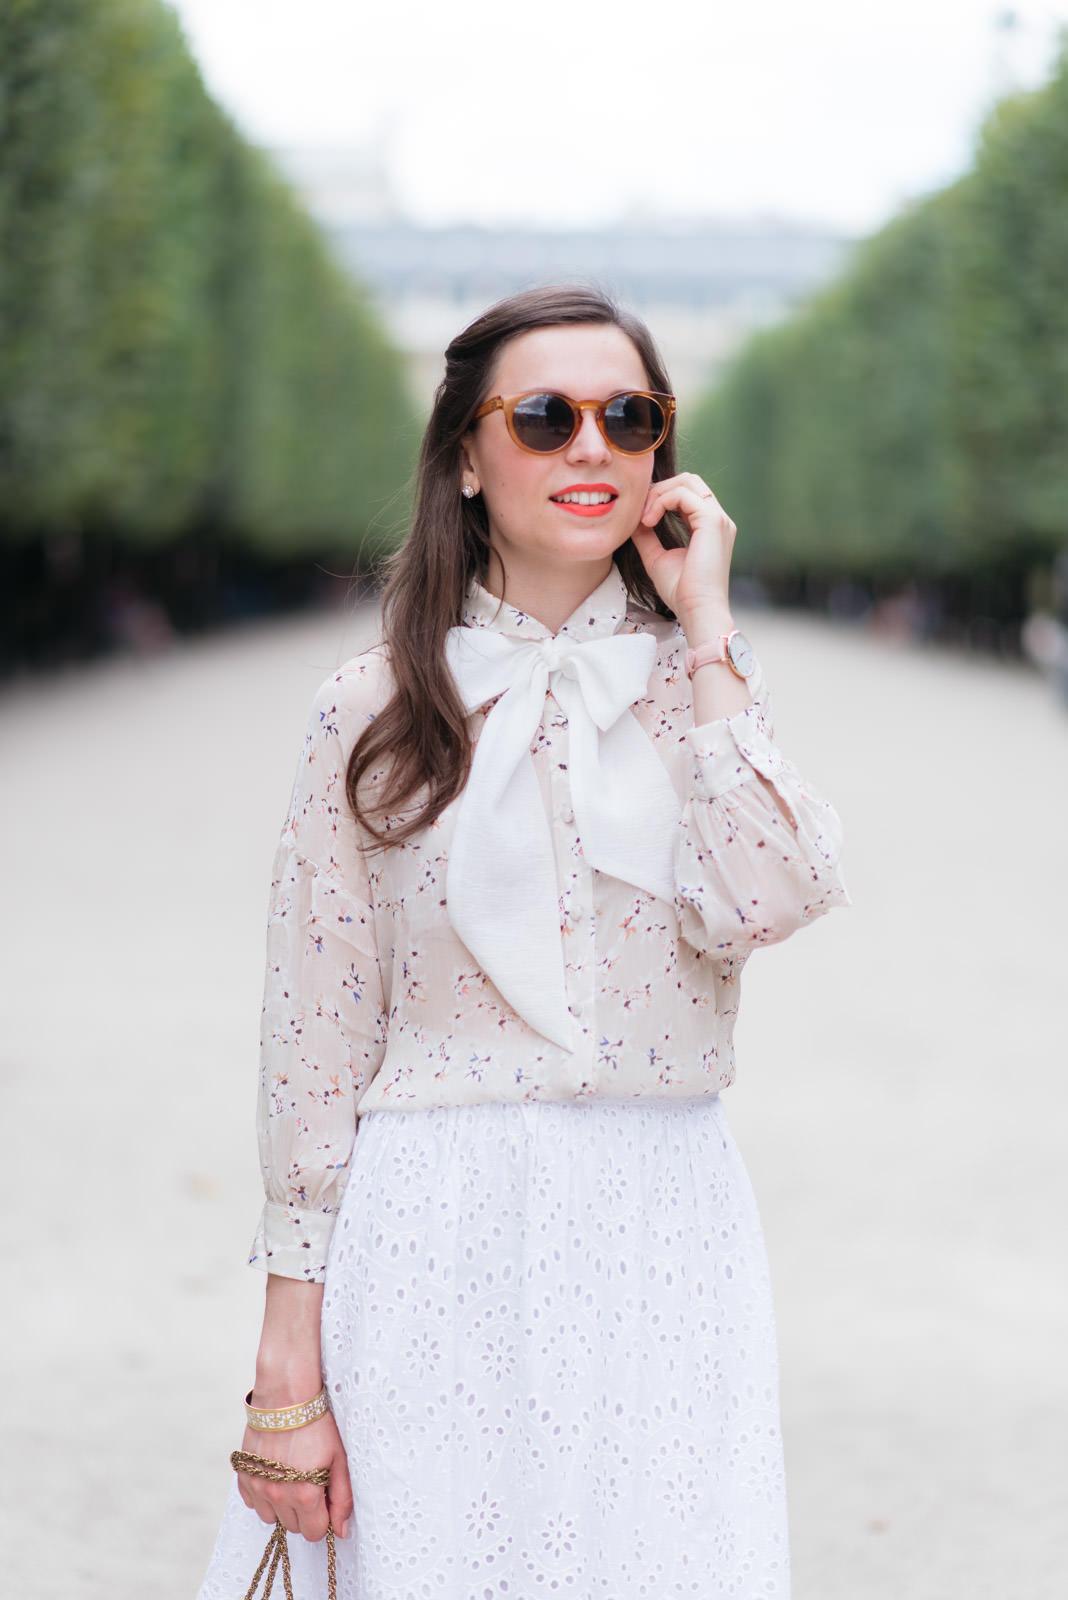 Blog-Mode-And-The-City-Looks-Blouse-Sister-Jane-Palais-Royal